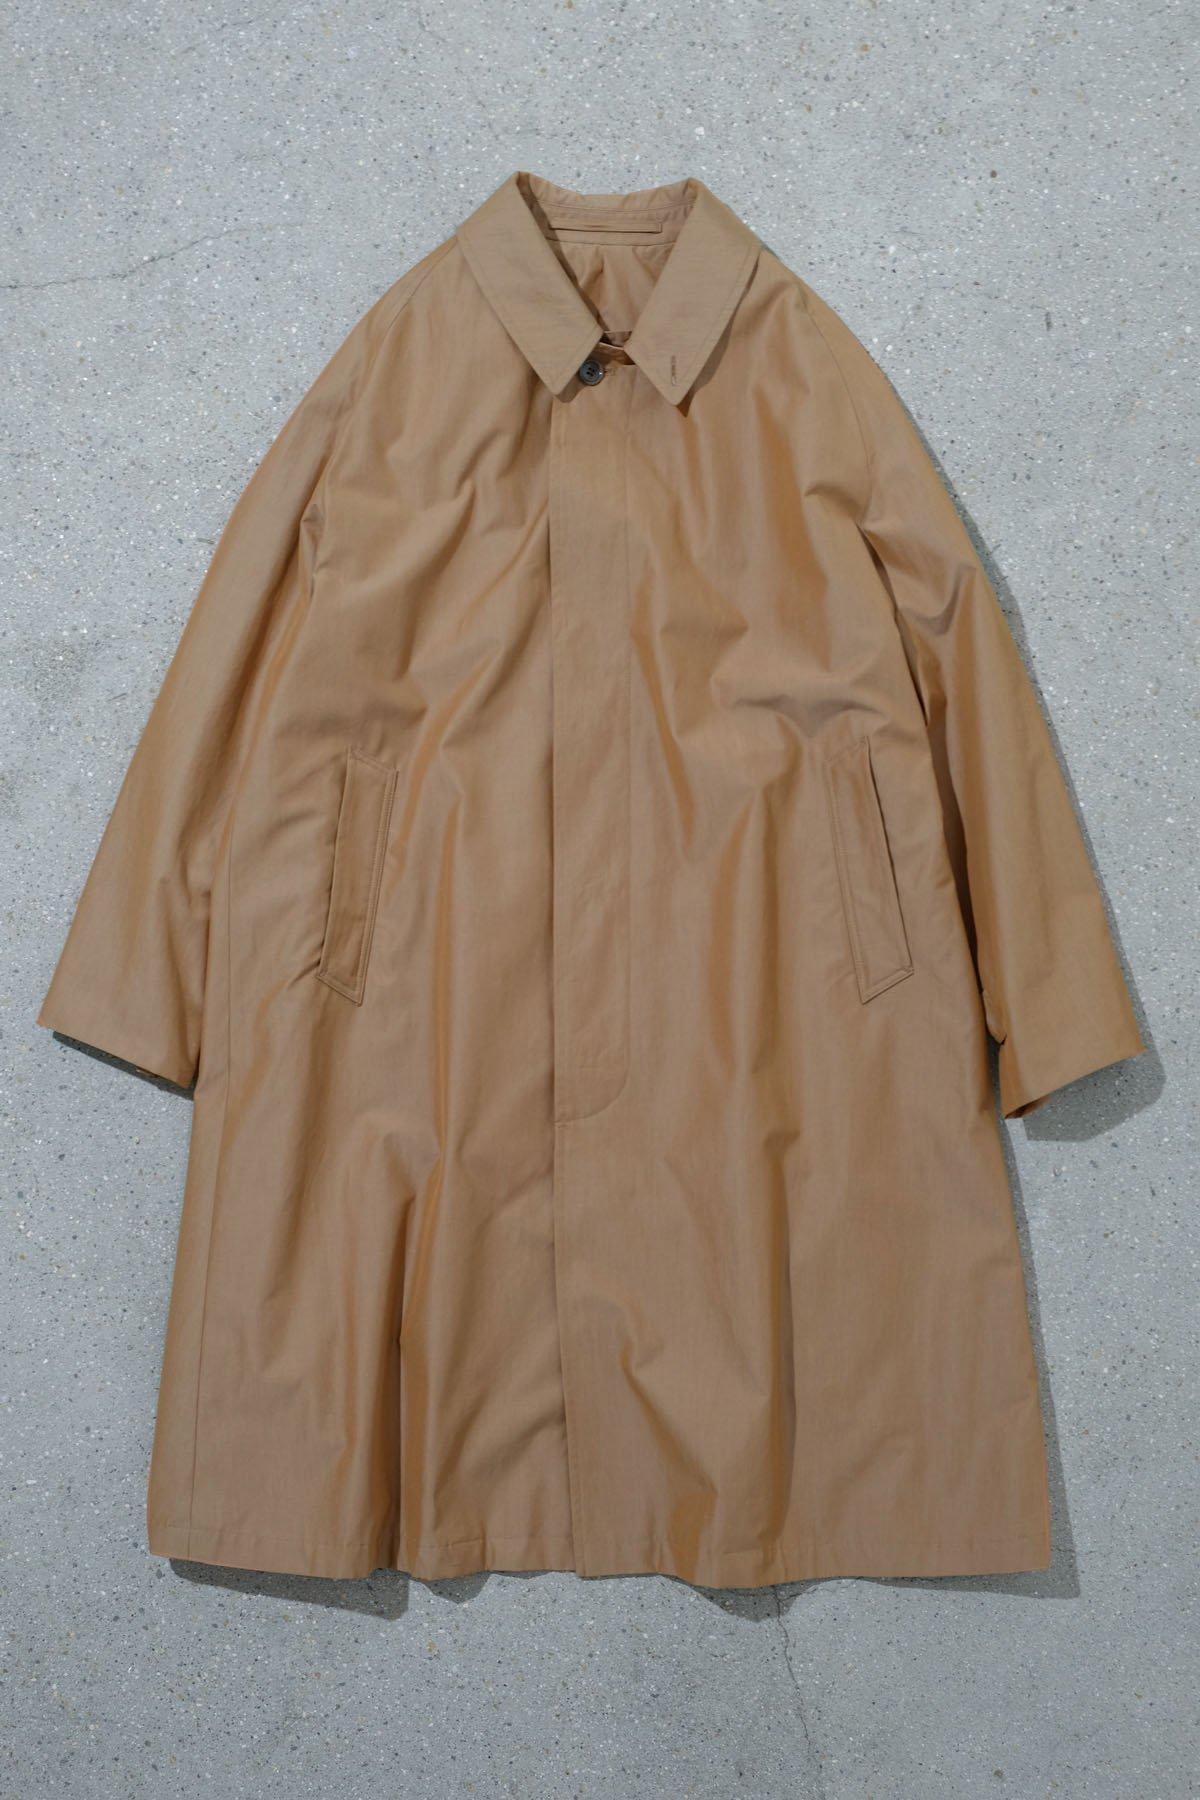 A.PRESSE / Balmacaan Coat